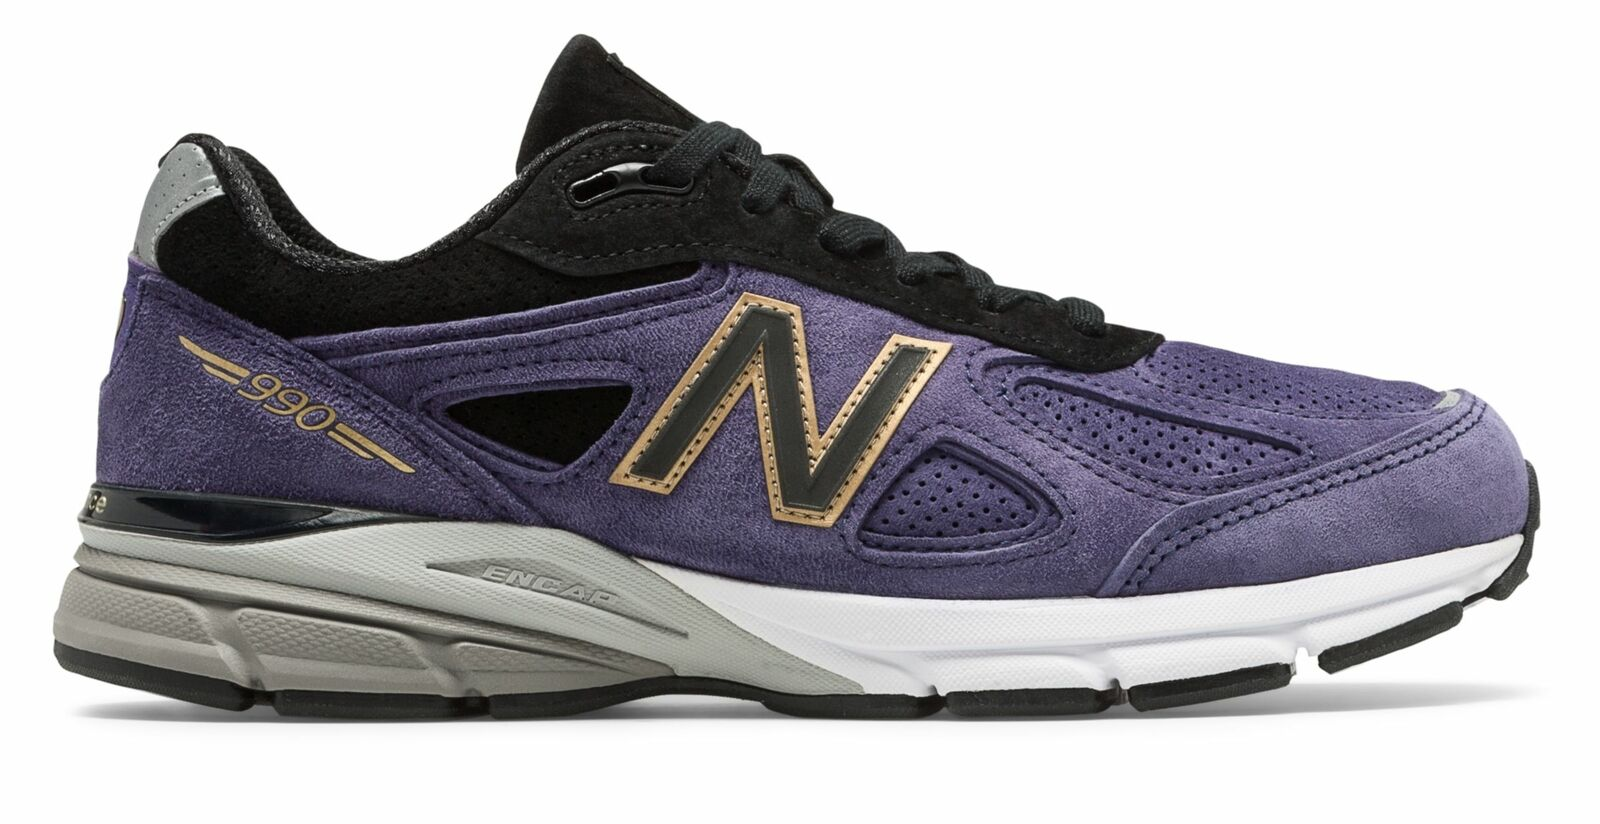 Hecho para hombre 990V4 New Balance en EE. UU. Zapatos Morado Con Negro